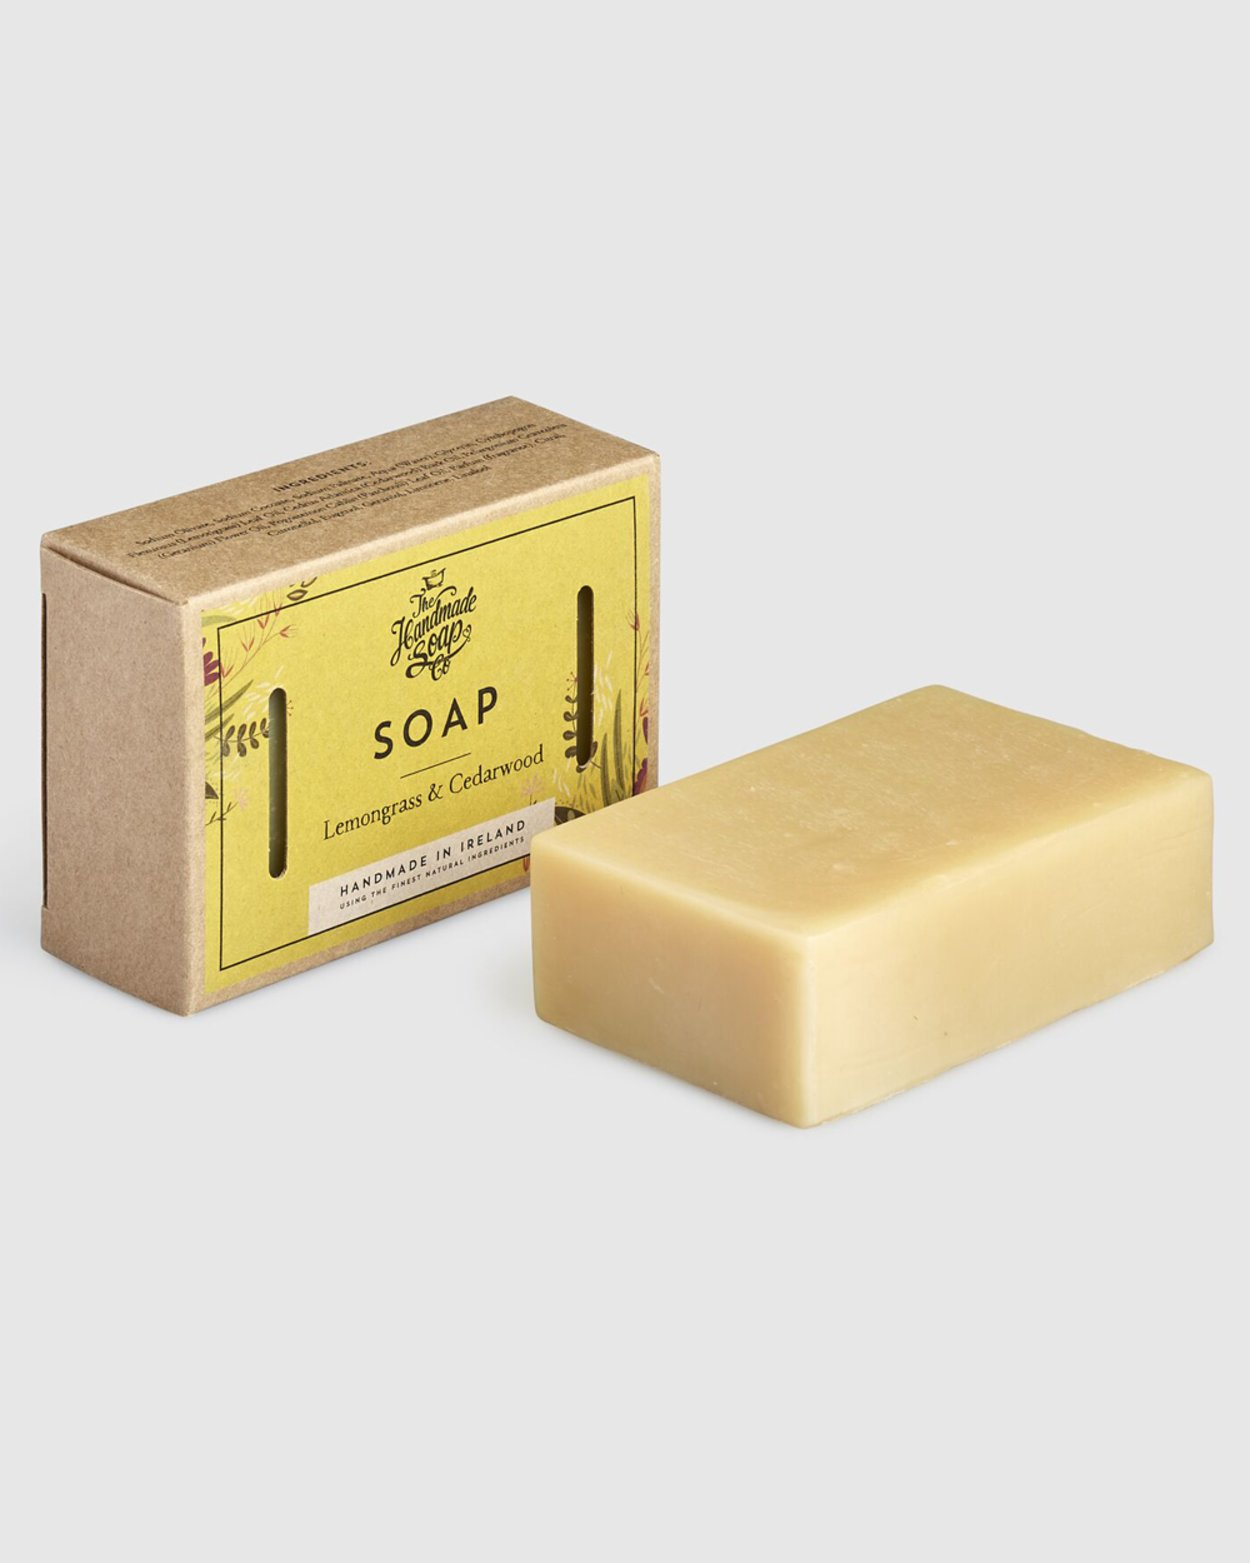 Lemongrass & Cedarwood Soap